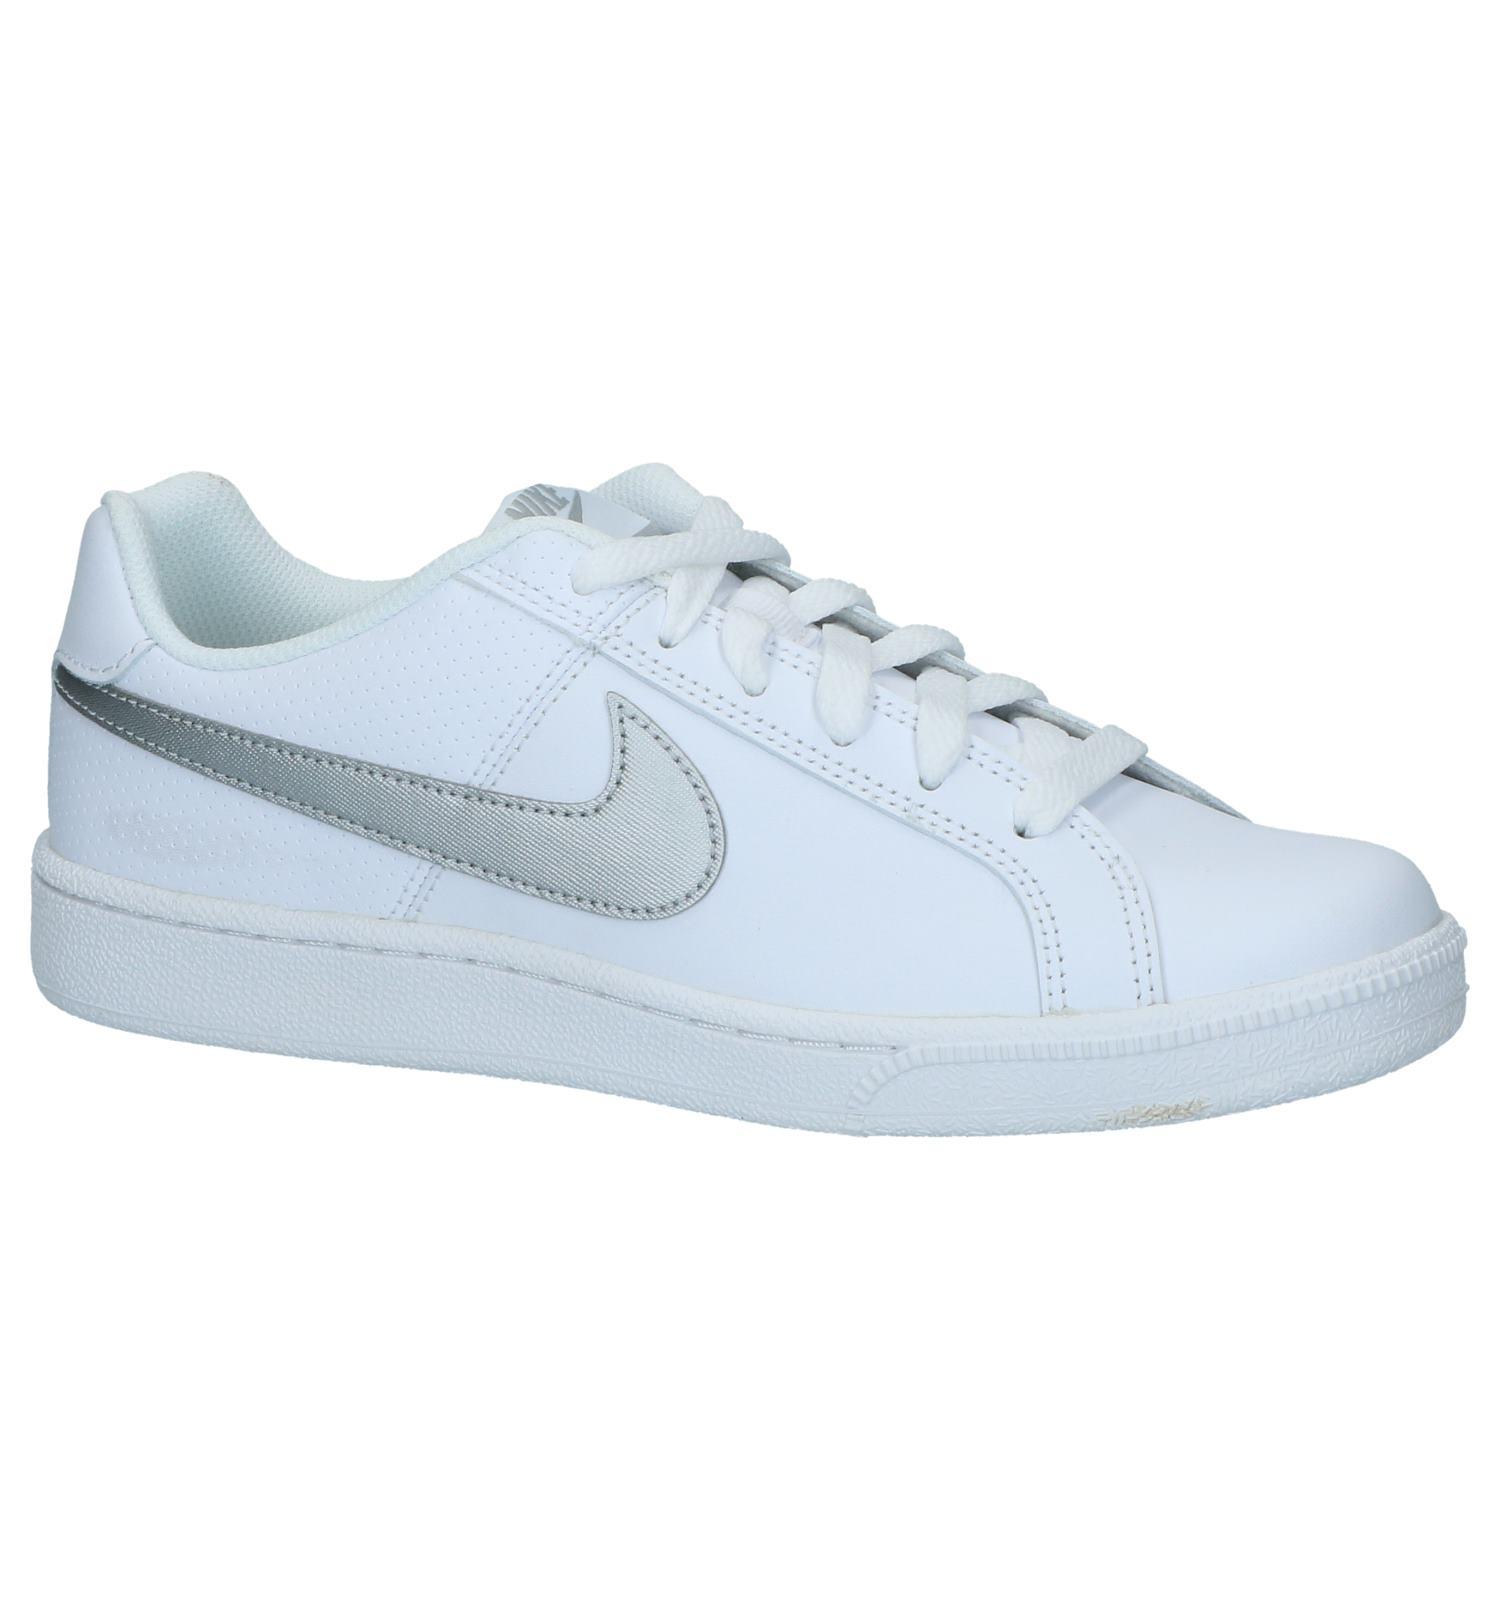 15ebfb17981 Royale be Sneakers Court Nike Lage Torfs En Verzend Gratis Witte wOB1qTxIZn